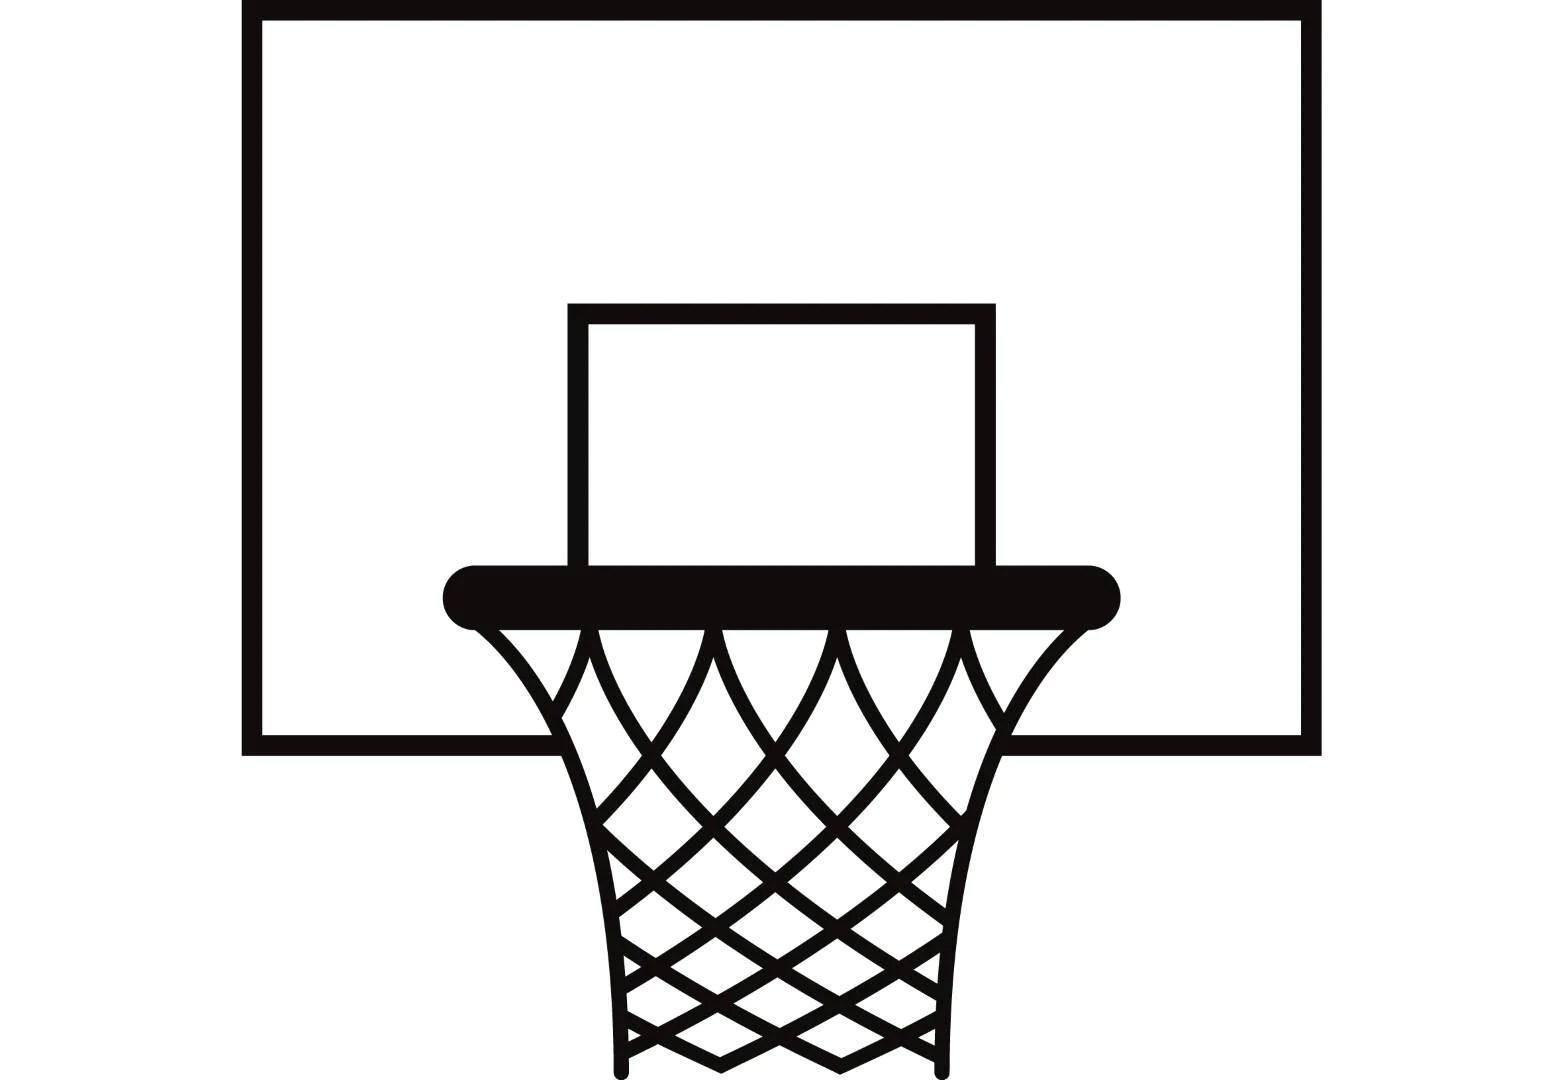 Basketball Hoop 1 Backboard Goal Rim Basket Net Sports Game Icon Logo G Eps Instant